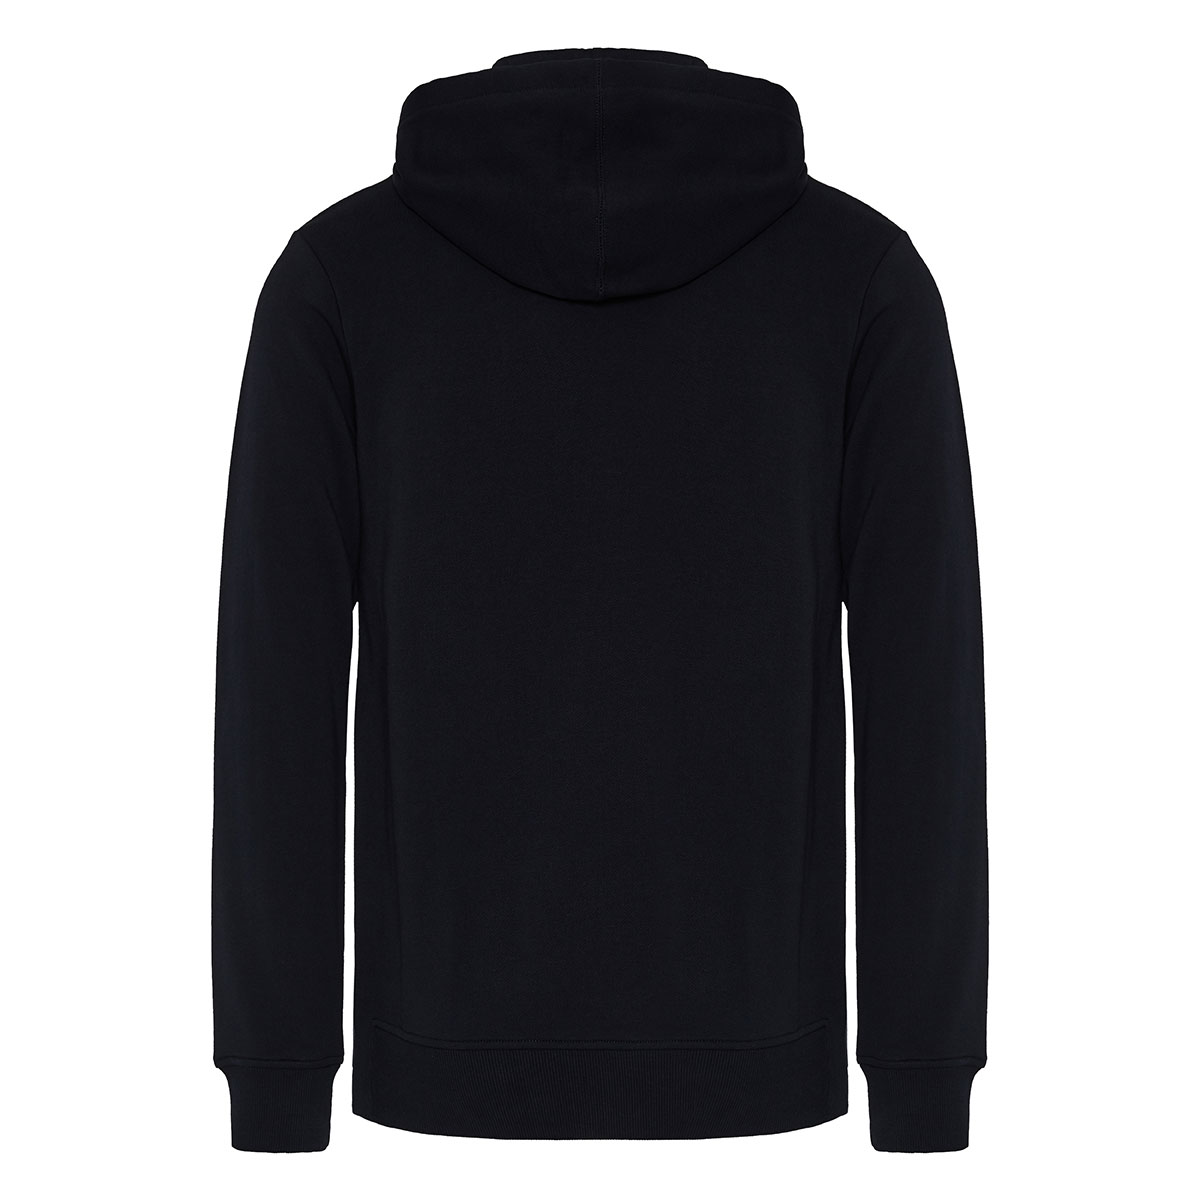 Japanese print cotton hoodie